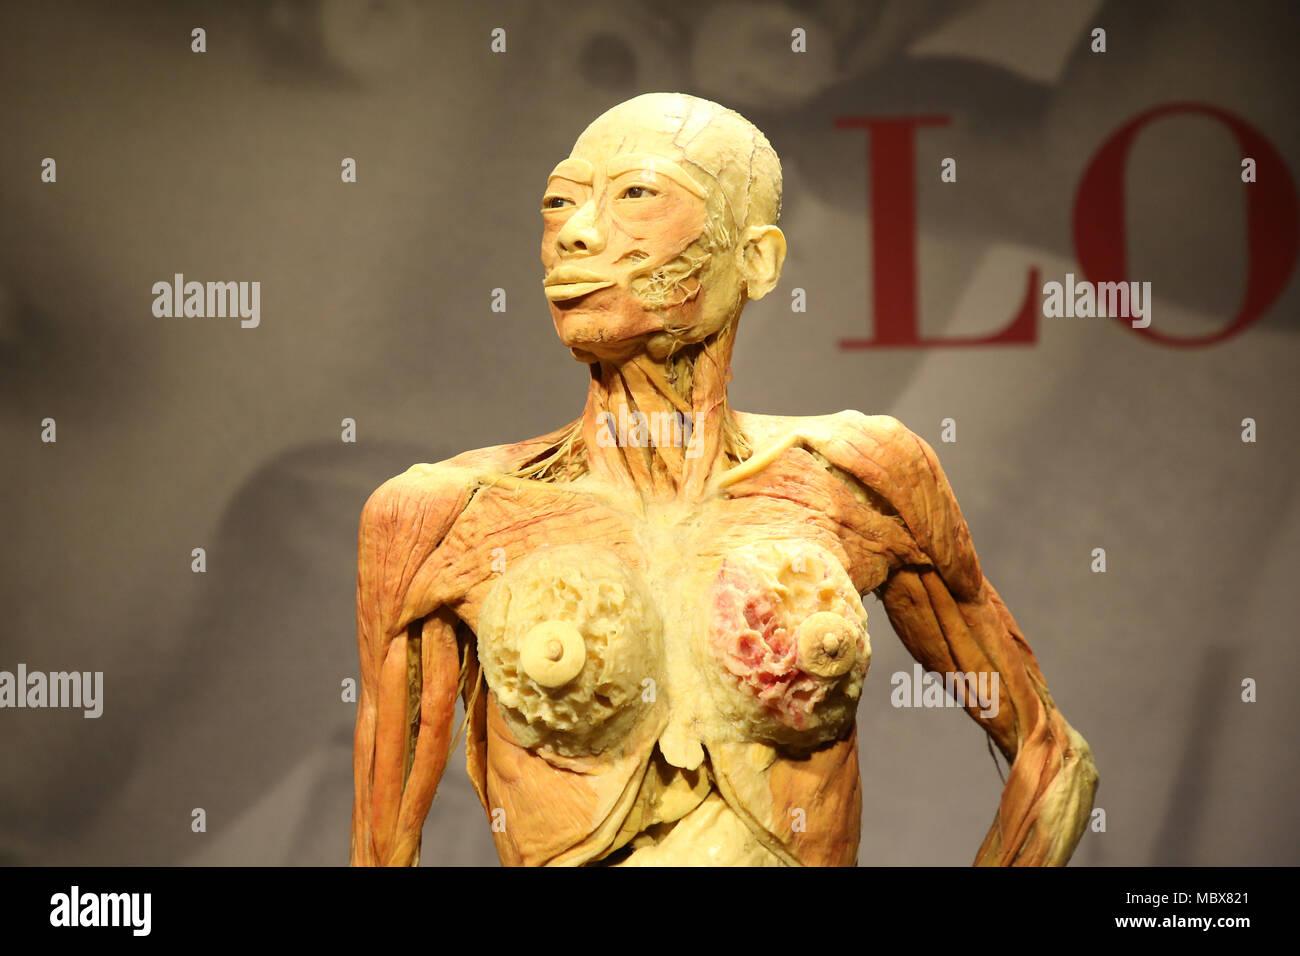 Female Circulatory System Stock Photos & Female Circulatory System ...